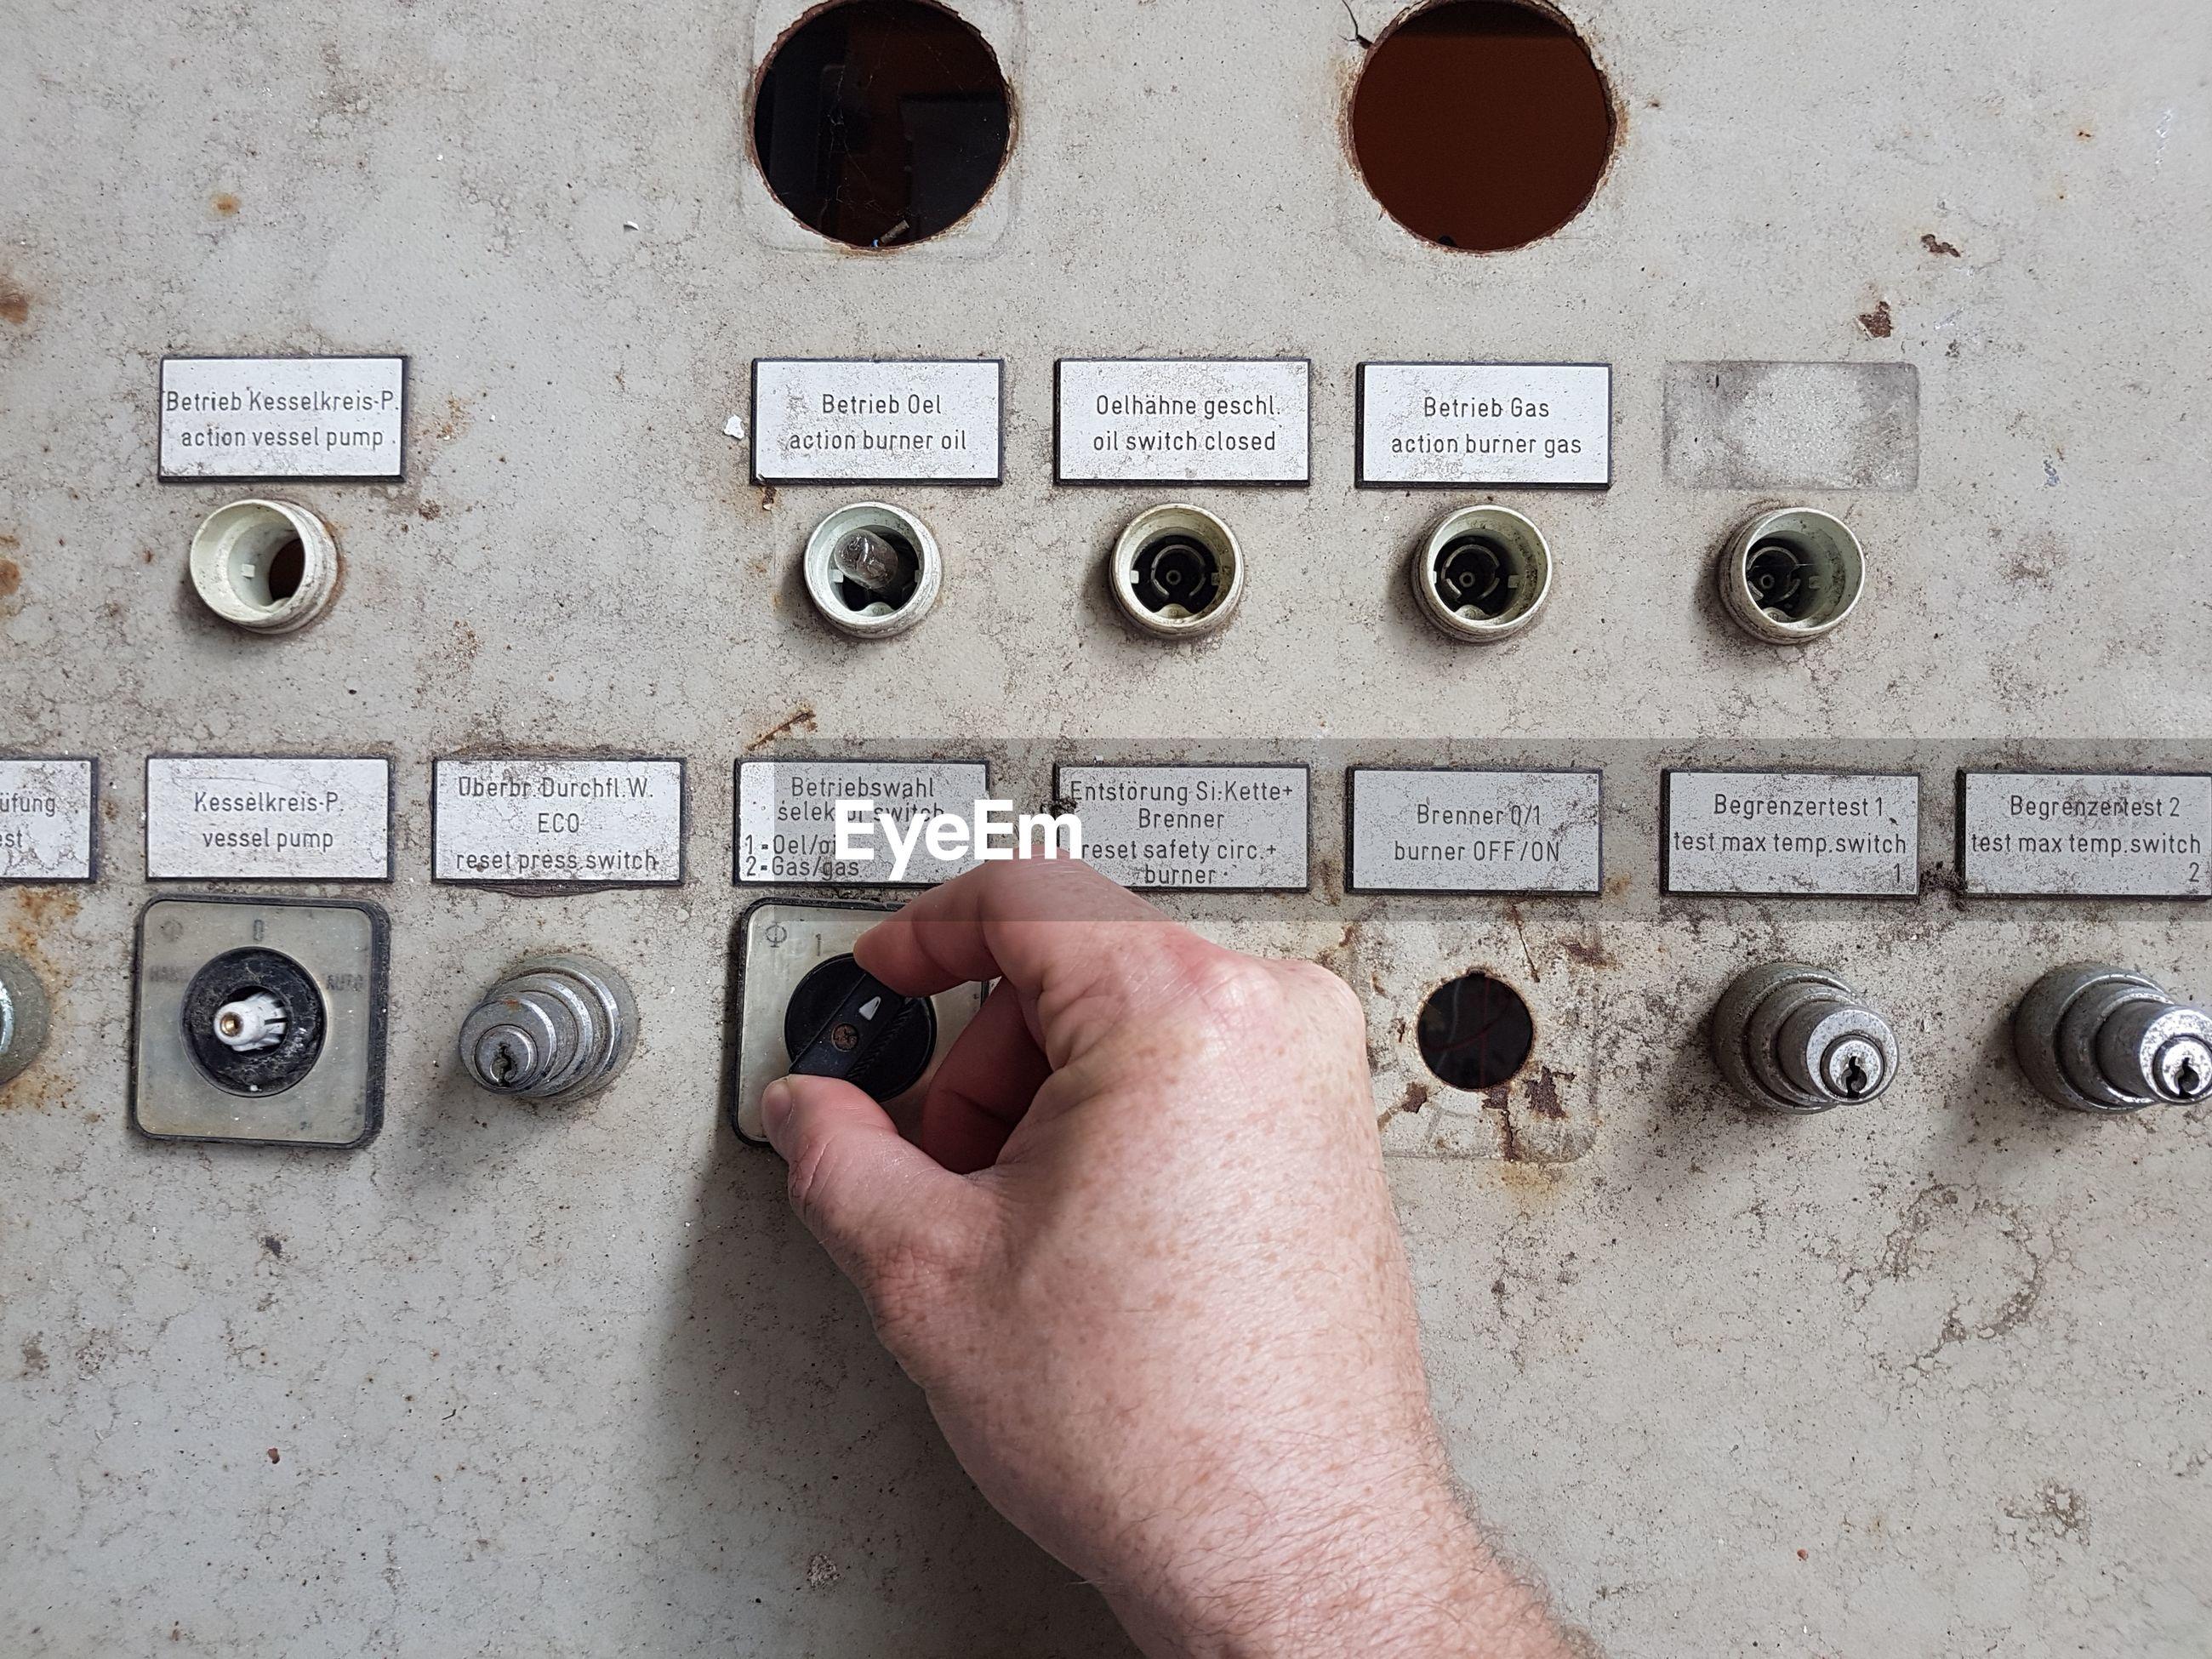 Cropped hand of man adjusting machinery knob